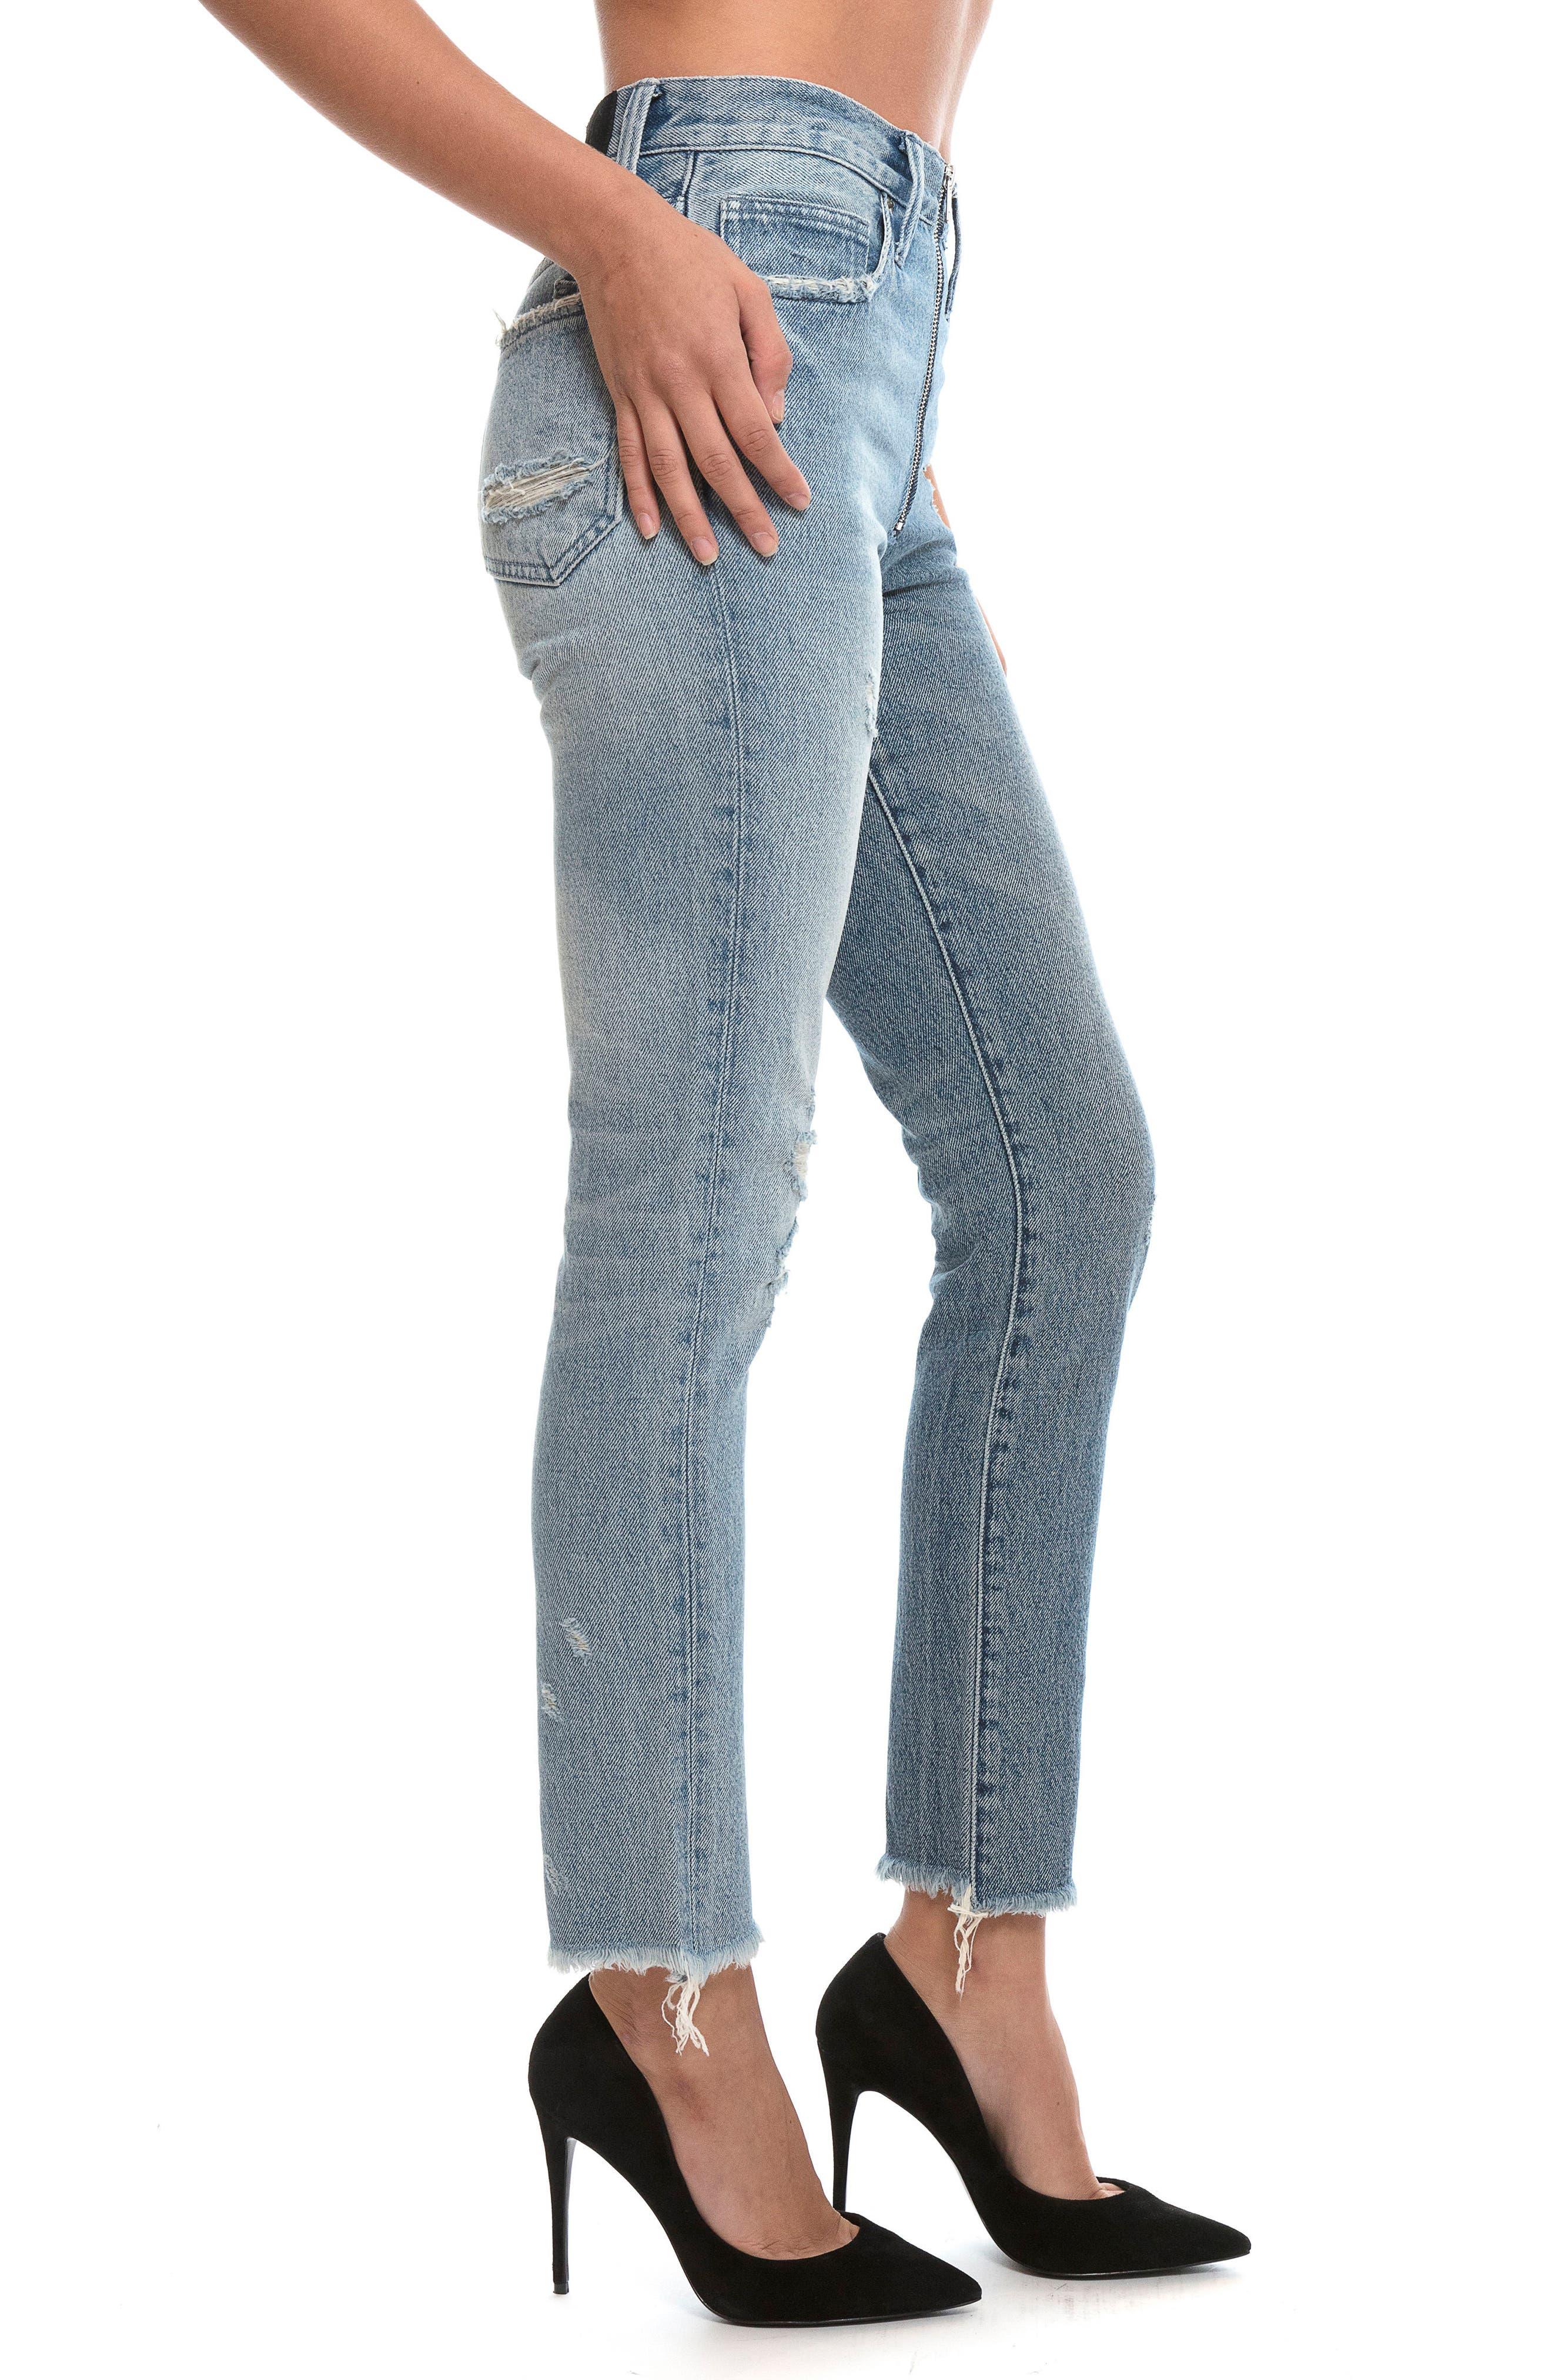 Chevelle Ankle Skinny Jeans,                             Alternate thumbnail 4, color,                             490